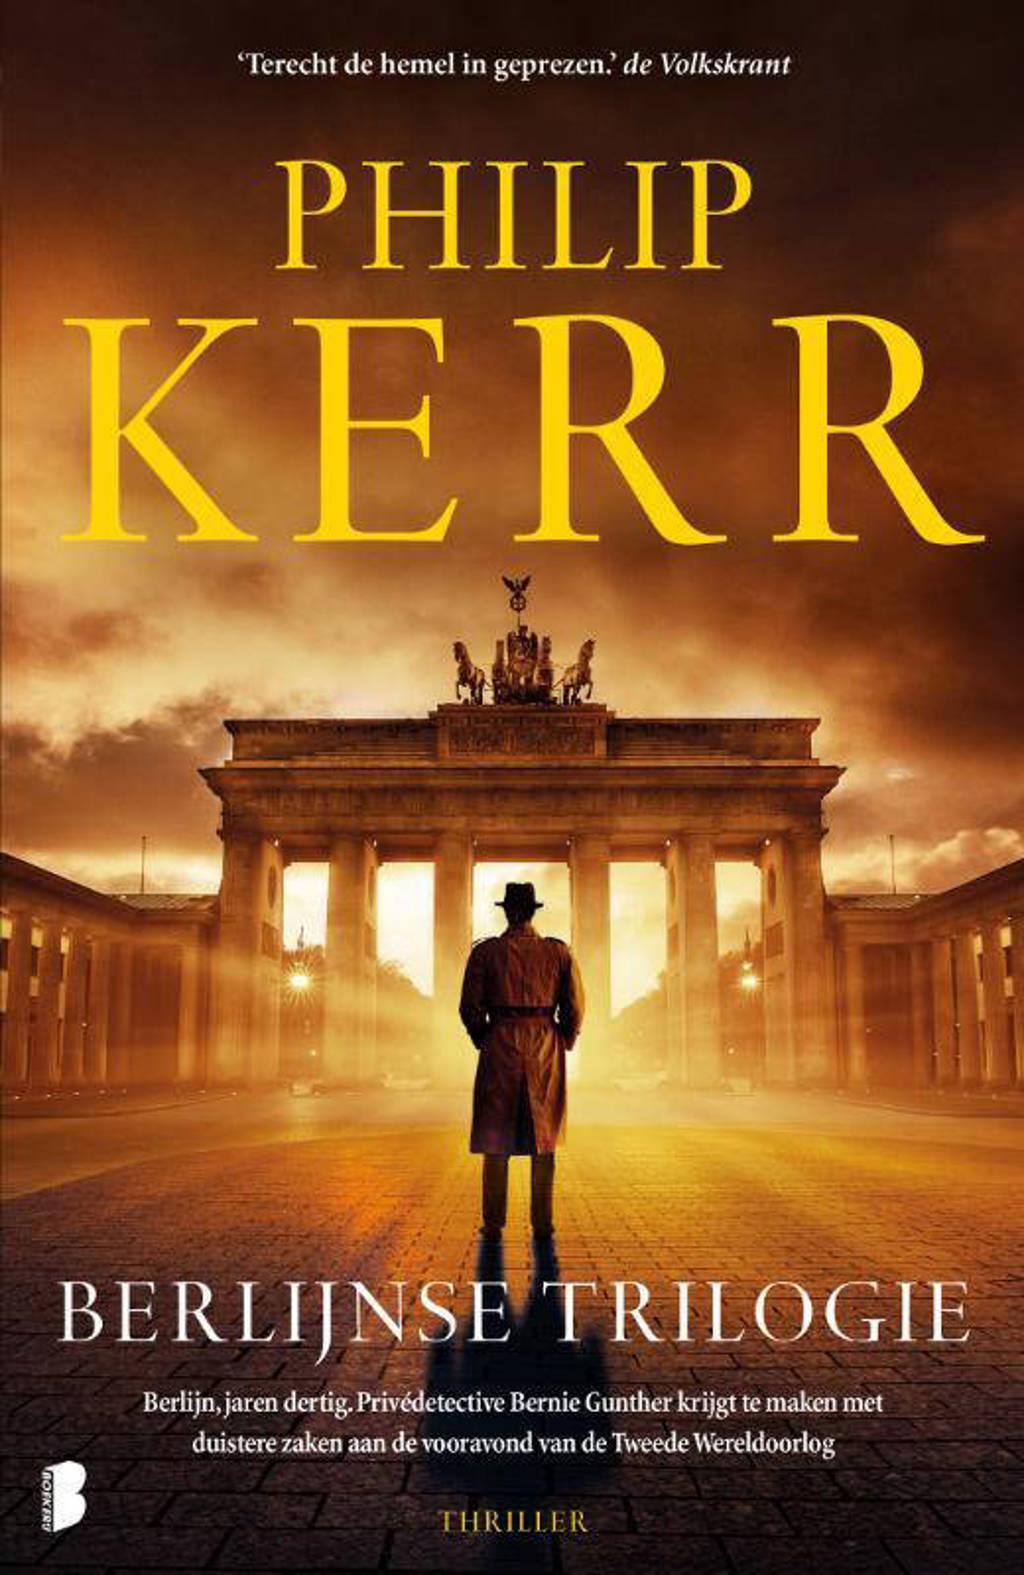 Bernie Gunther: Berlijnse trilogie - Philip Kerr